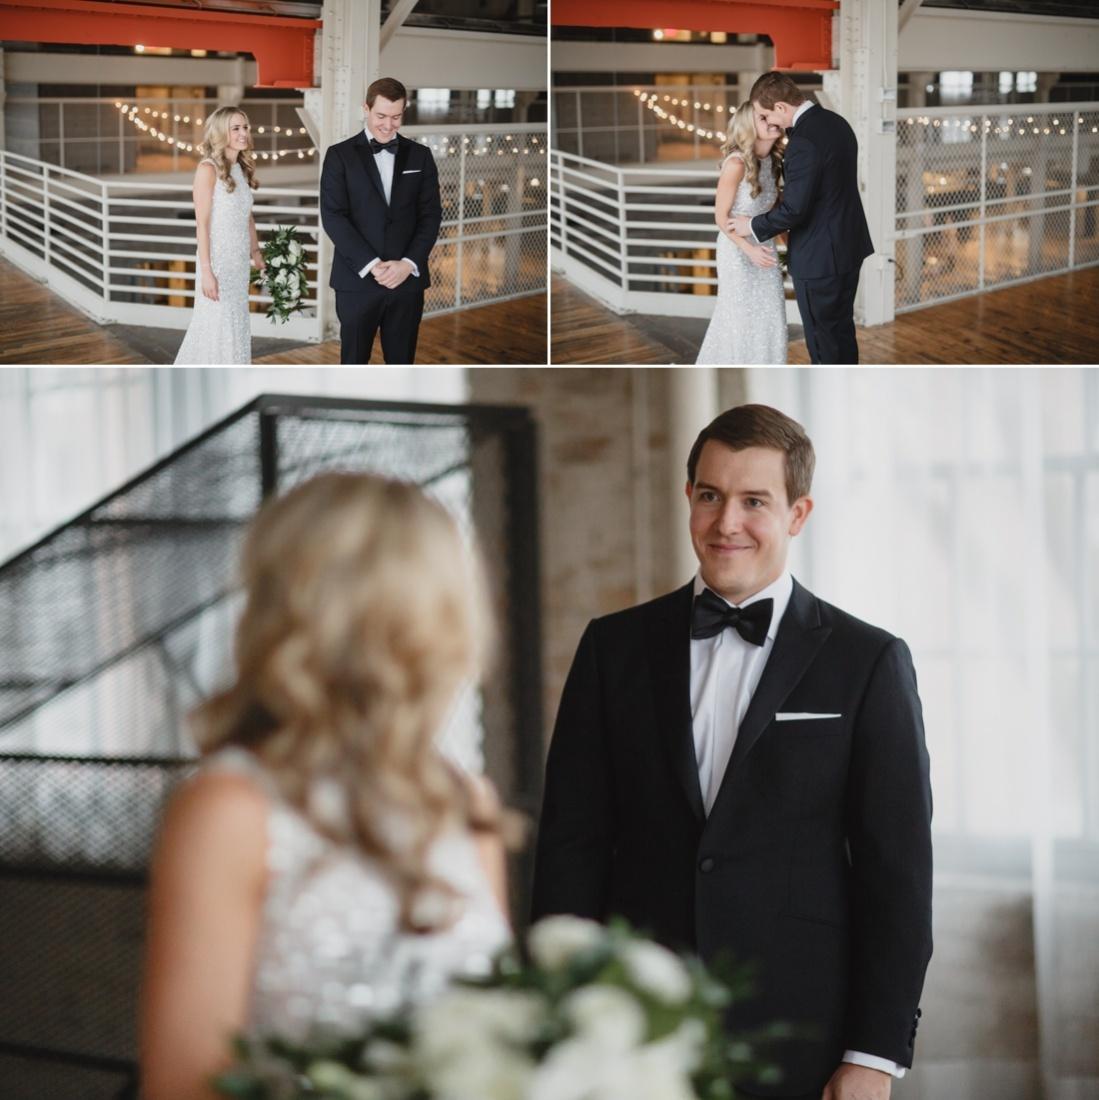 07_Minneapolis_Machine_Shop_Wedding-1099x1100-1.jpg